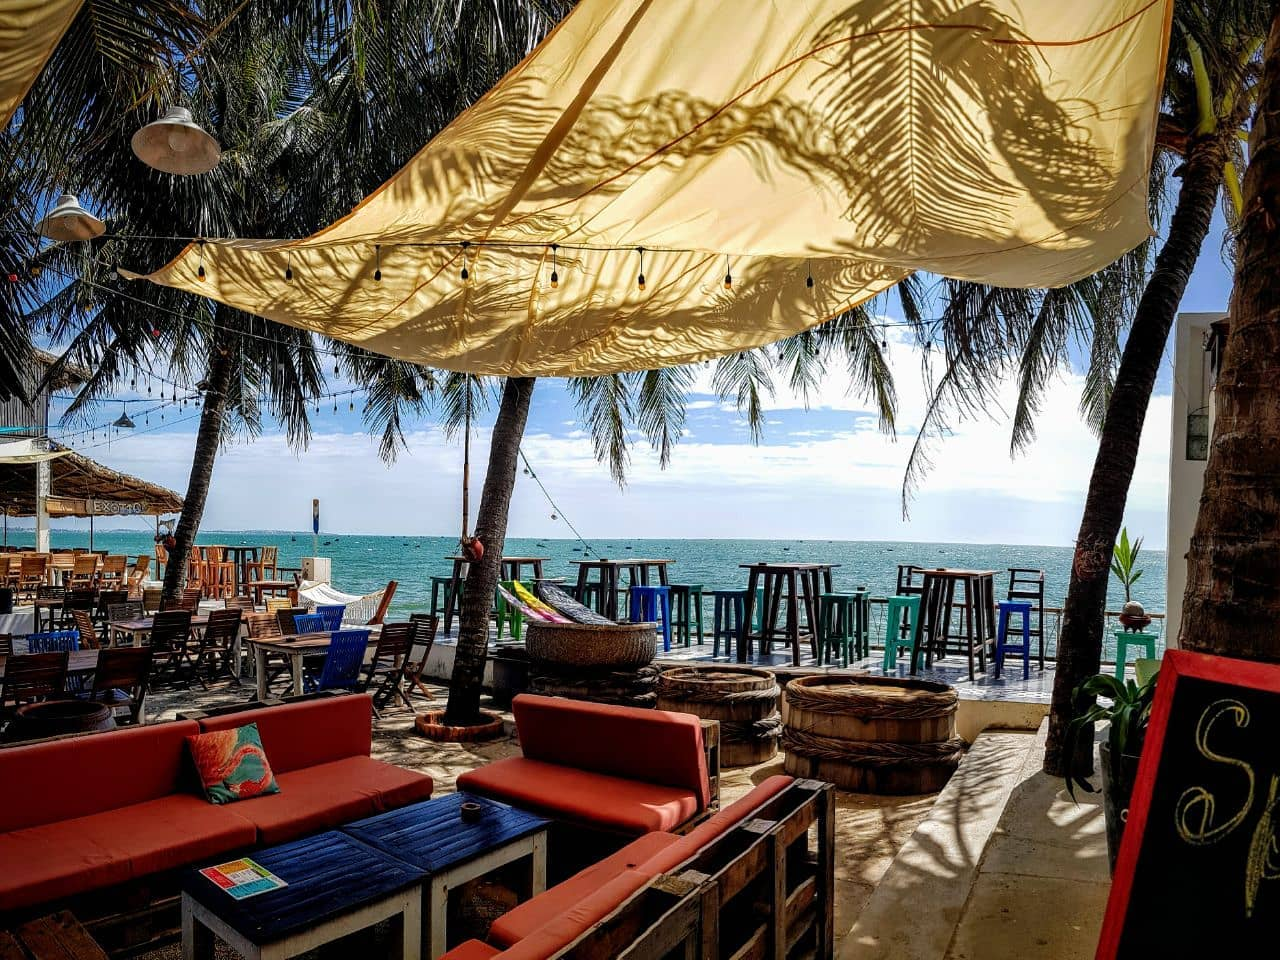 Image of the Pappa Goulash Hungarian restaurant in Phan Thiet, Vietnam